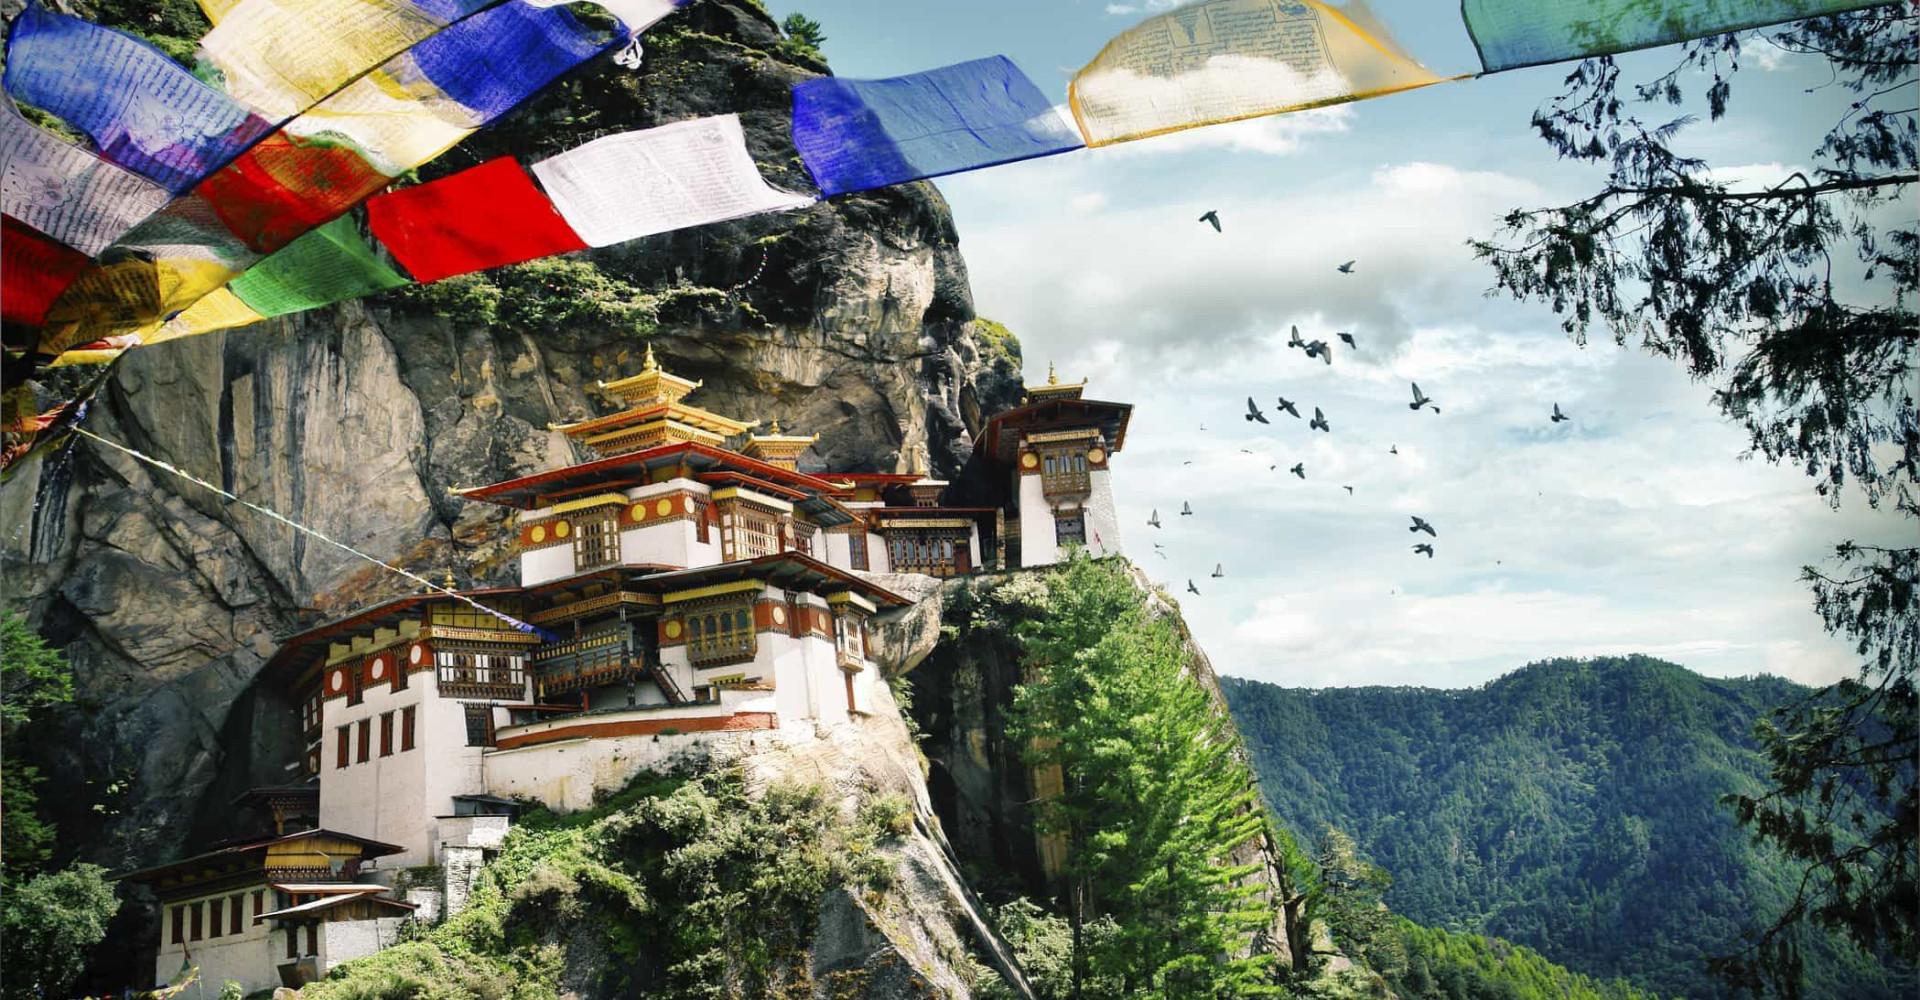 The Kingdom of Bhutan: your next travel destination